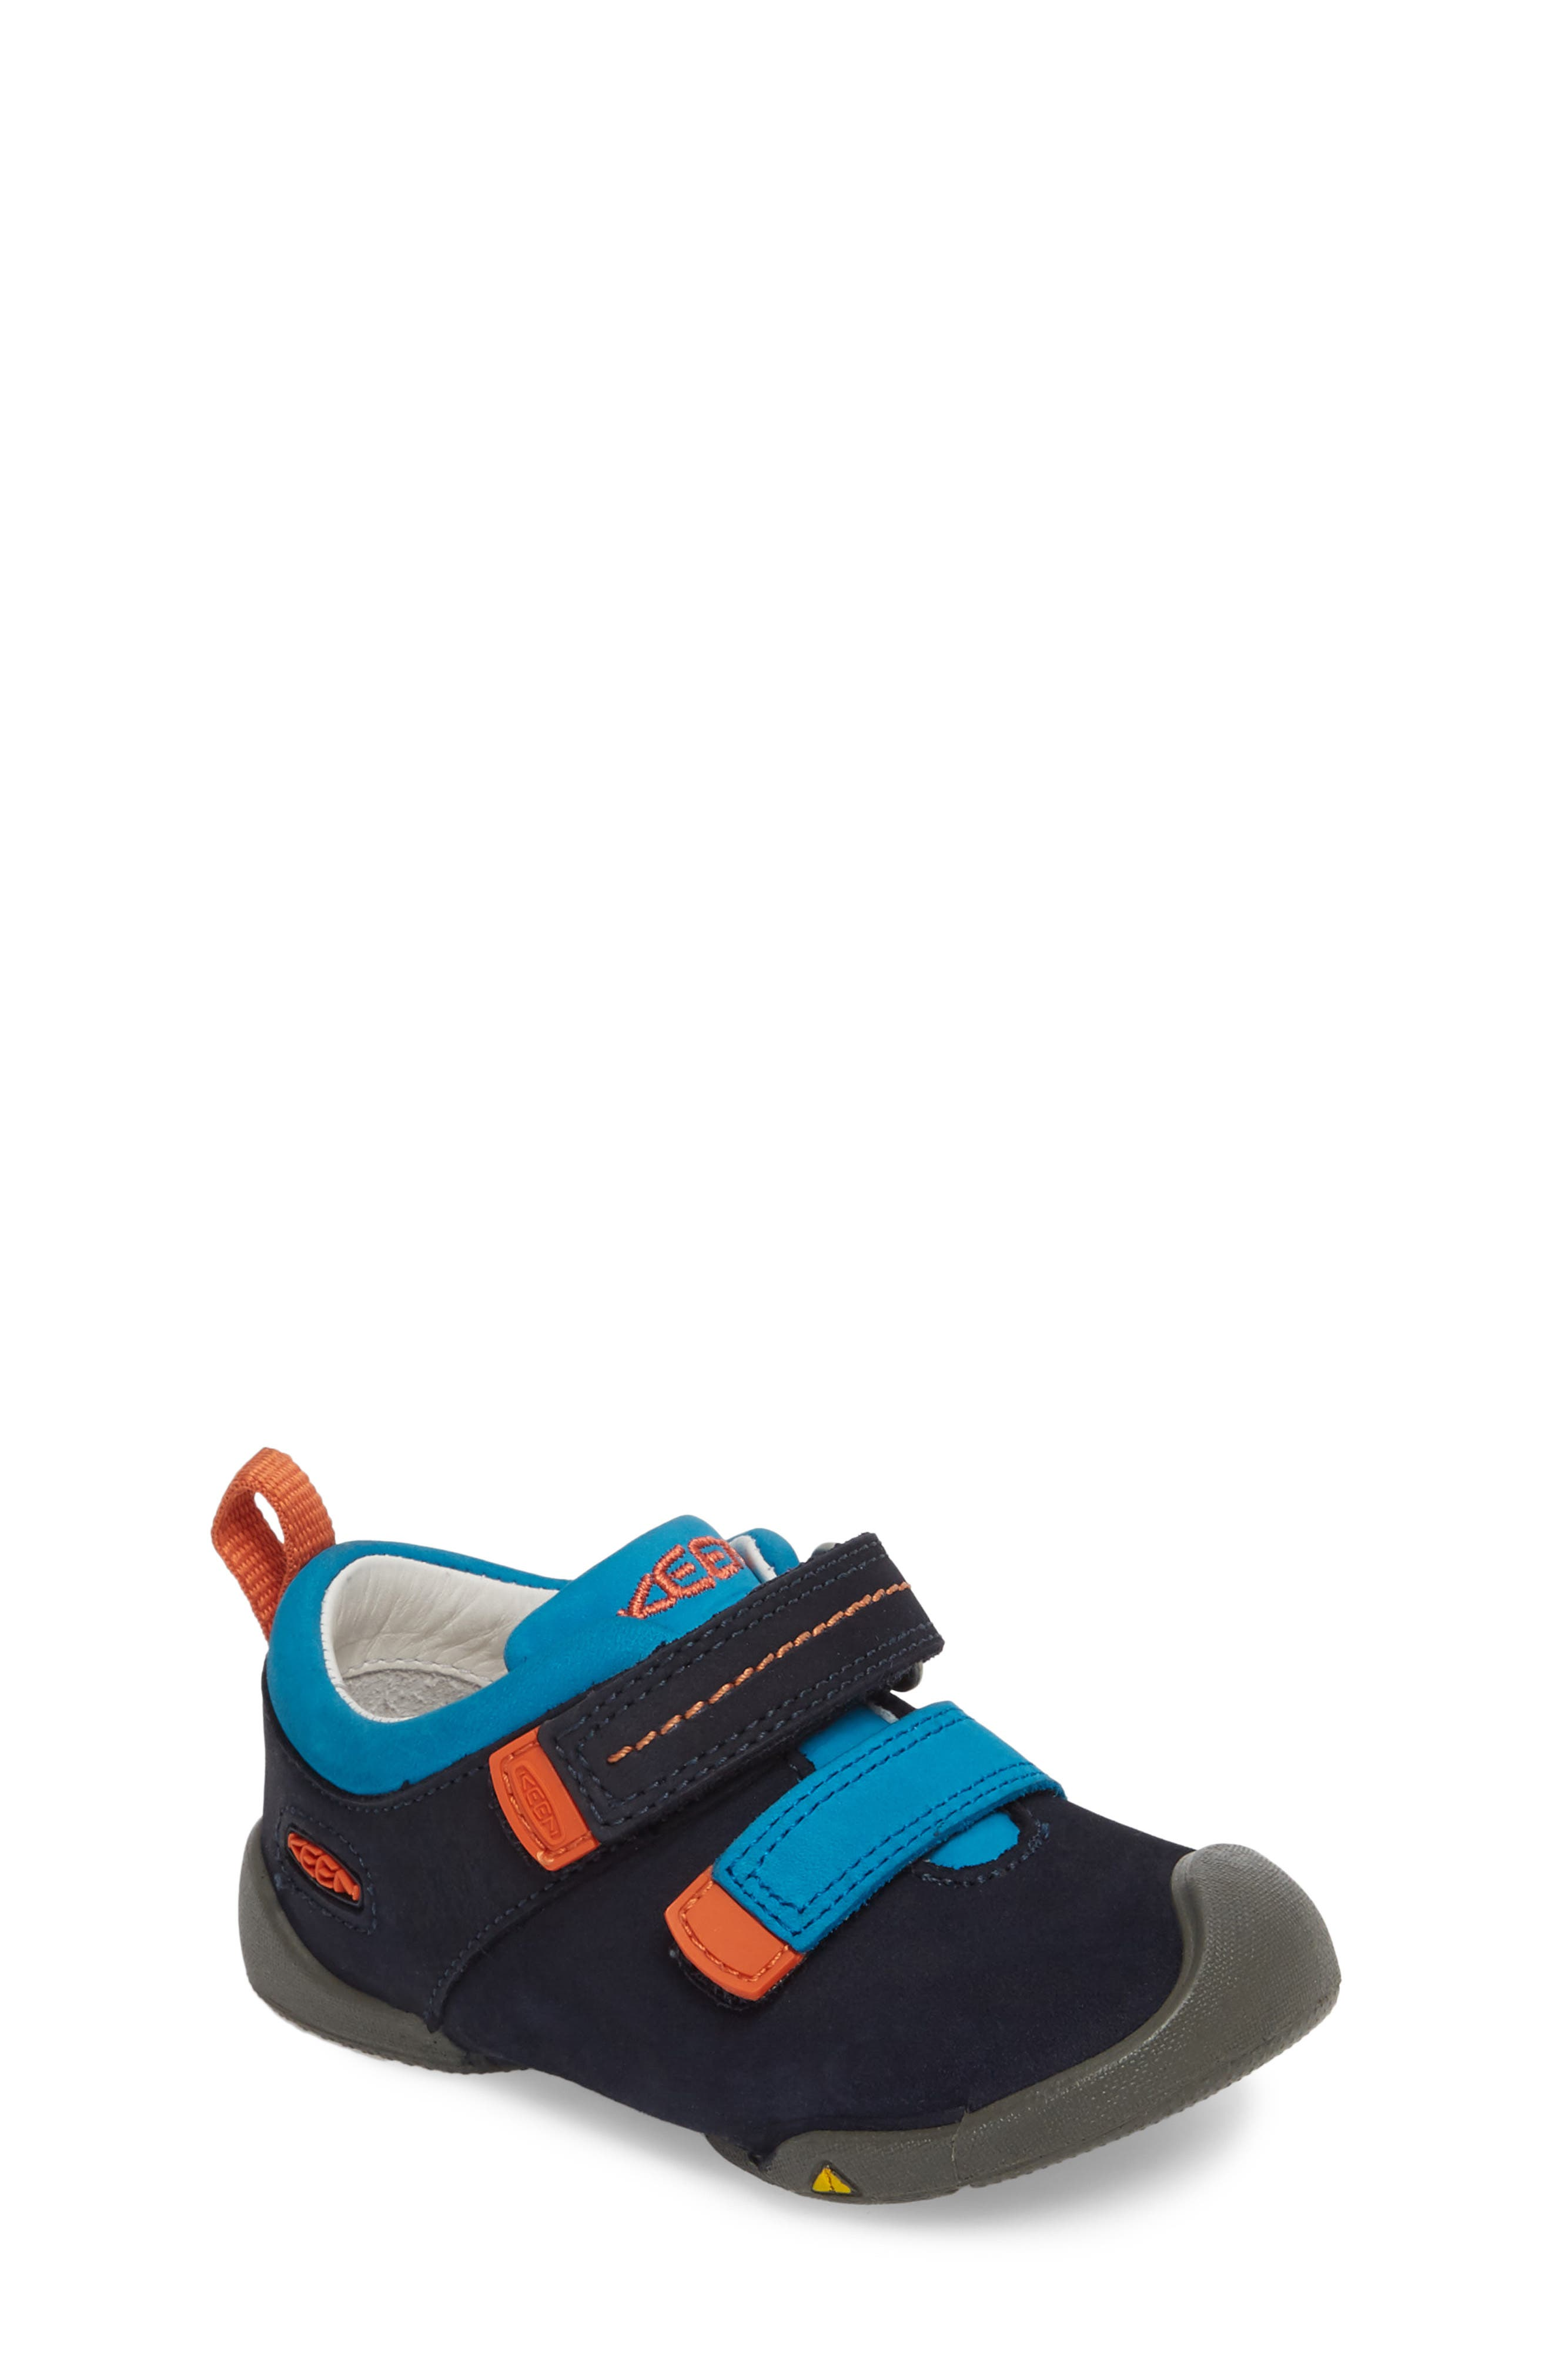 Pep Double Strap-T Sneaker,                             Main thumbnail 1, color,                             400